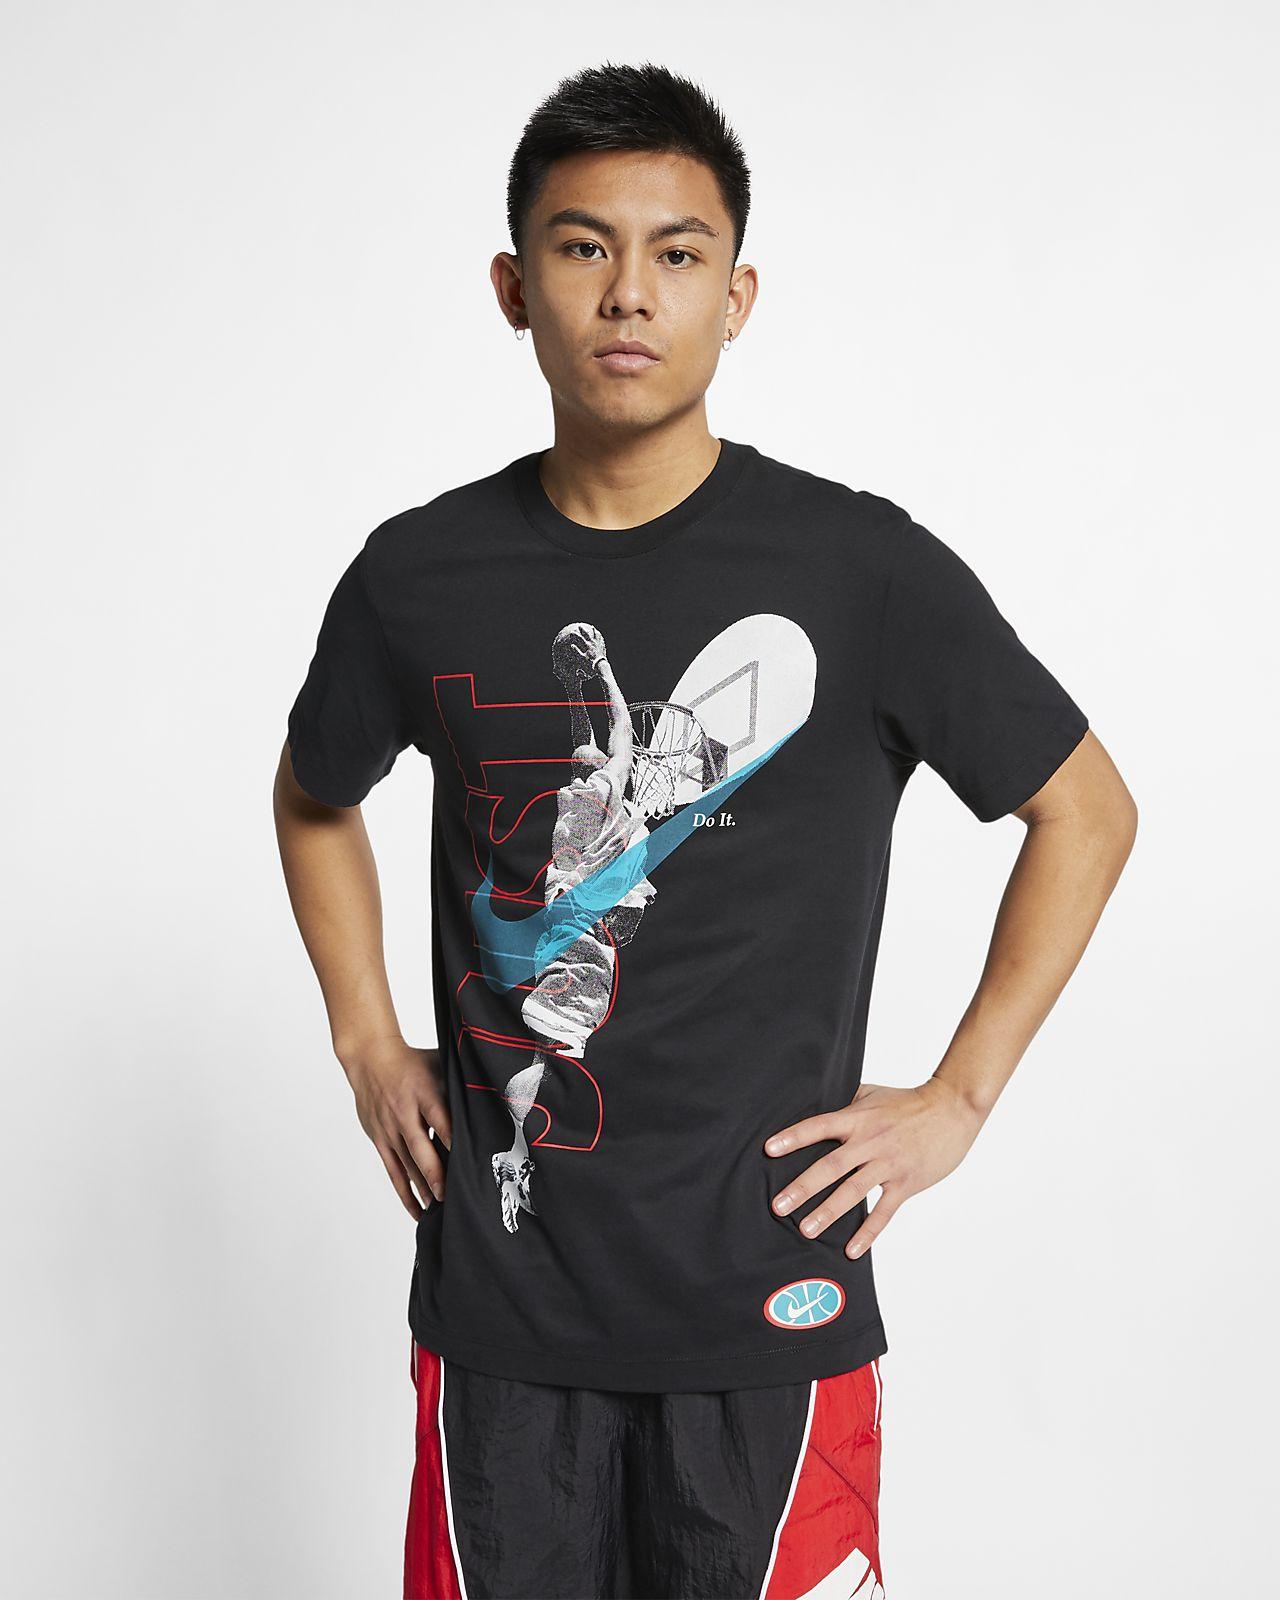 5554c66ae68 Nike Dri-FIT Men s Basketball T-Shirt. Nike.com